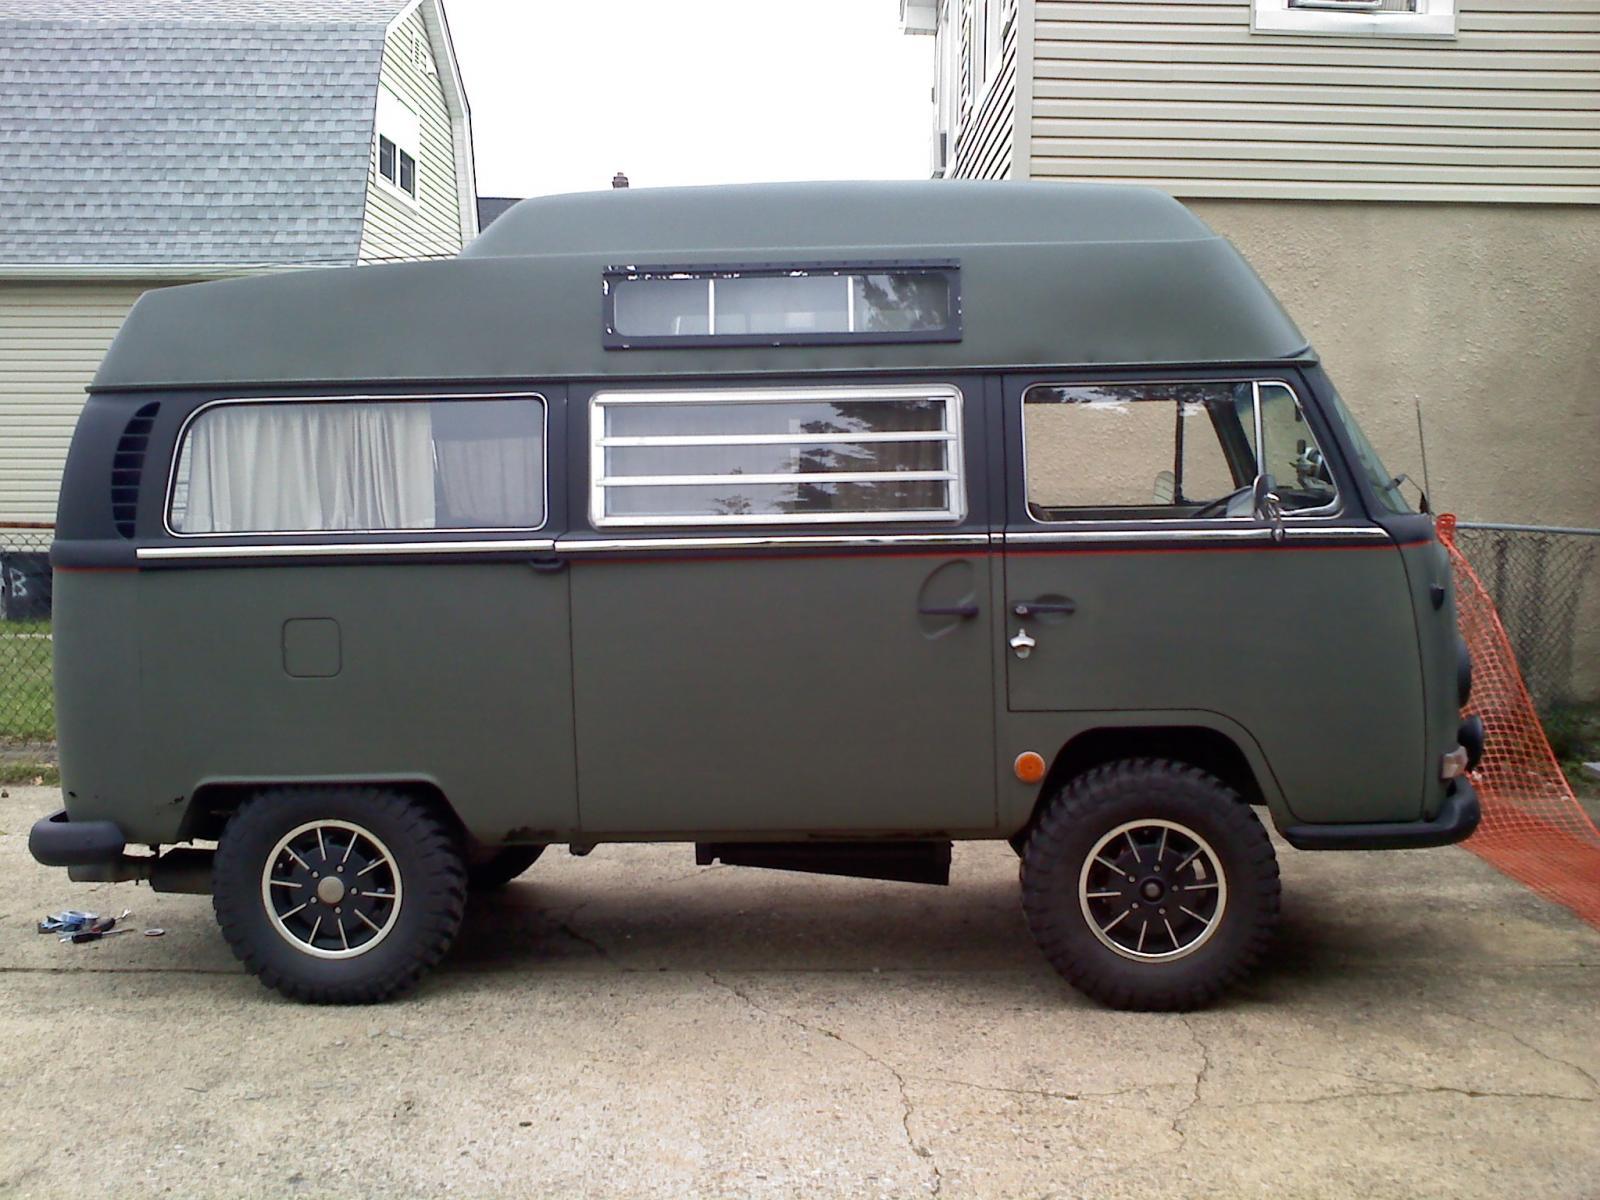 TheSamba com :: Bay Window Bus - View topic - Lifted bus specs